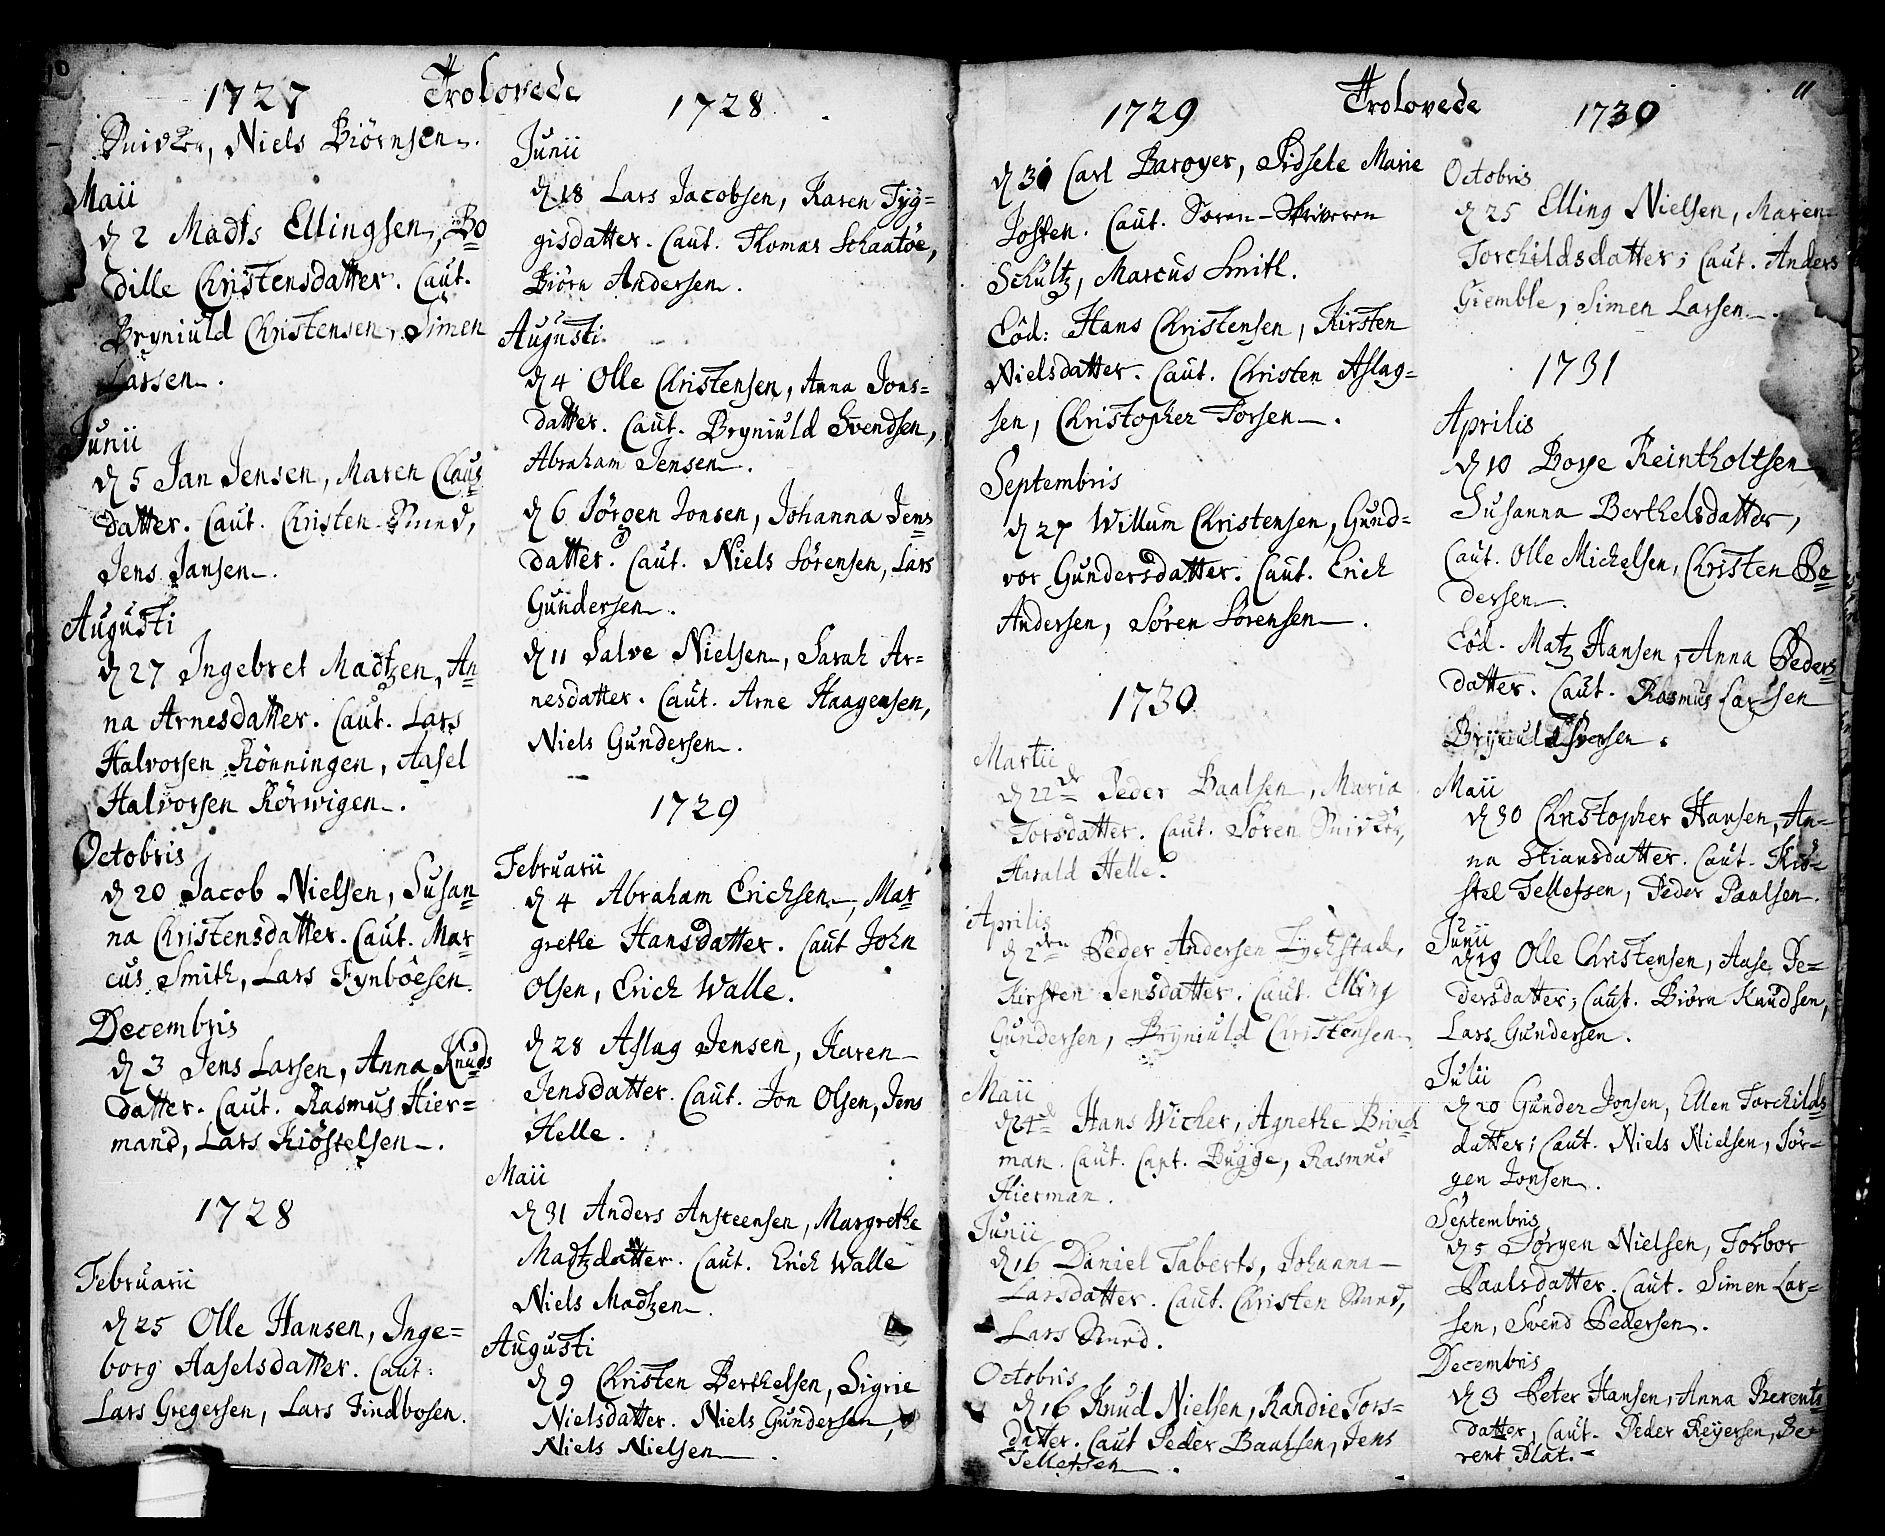 SAKO, Kragerø kirkebøker, F/Fa/L0001: Ministerialbok nr. 1, 1702-1766, s. 10-11